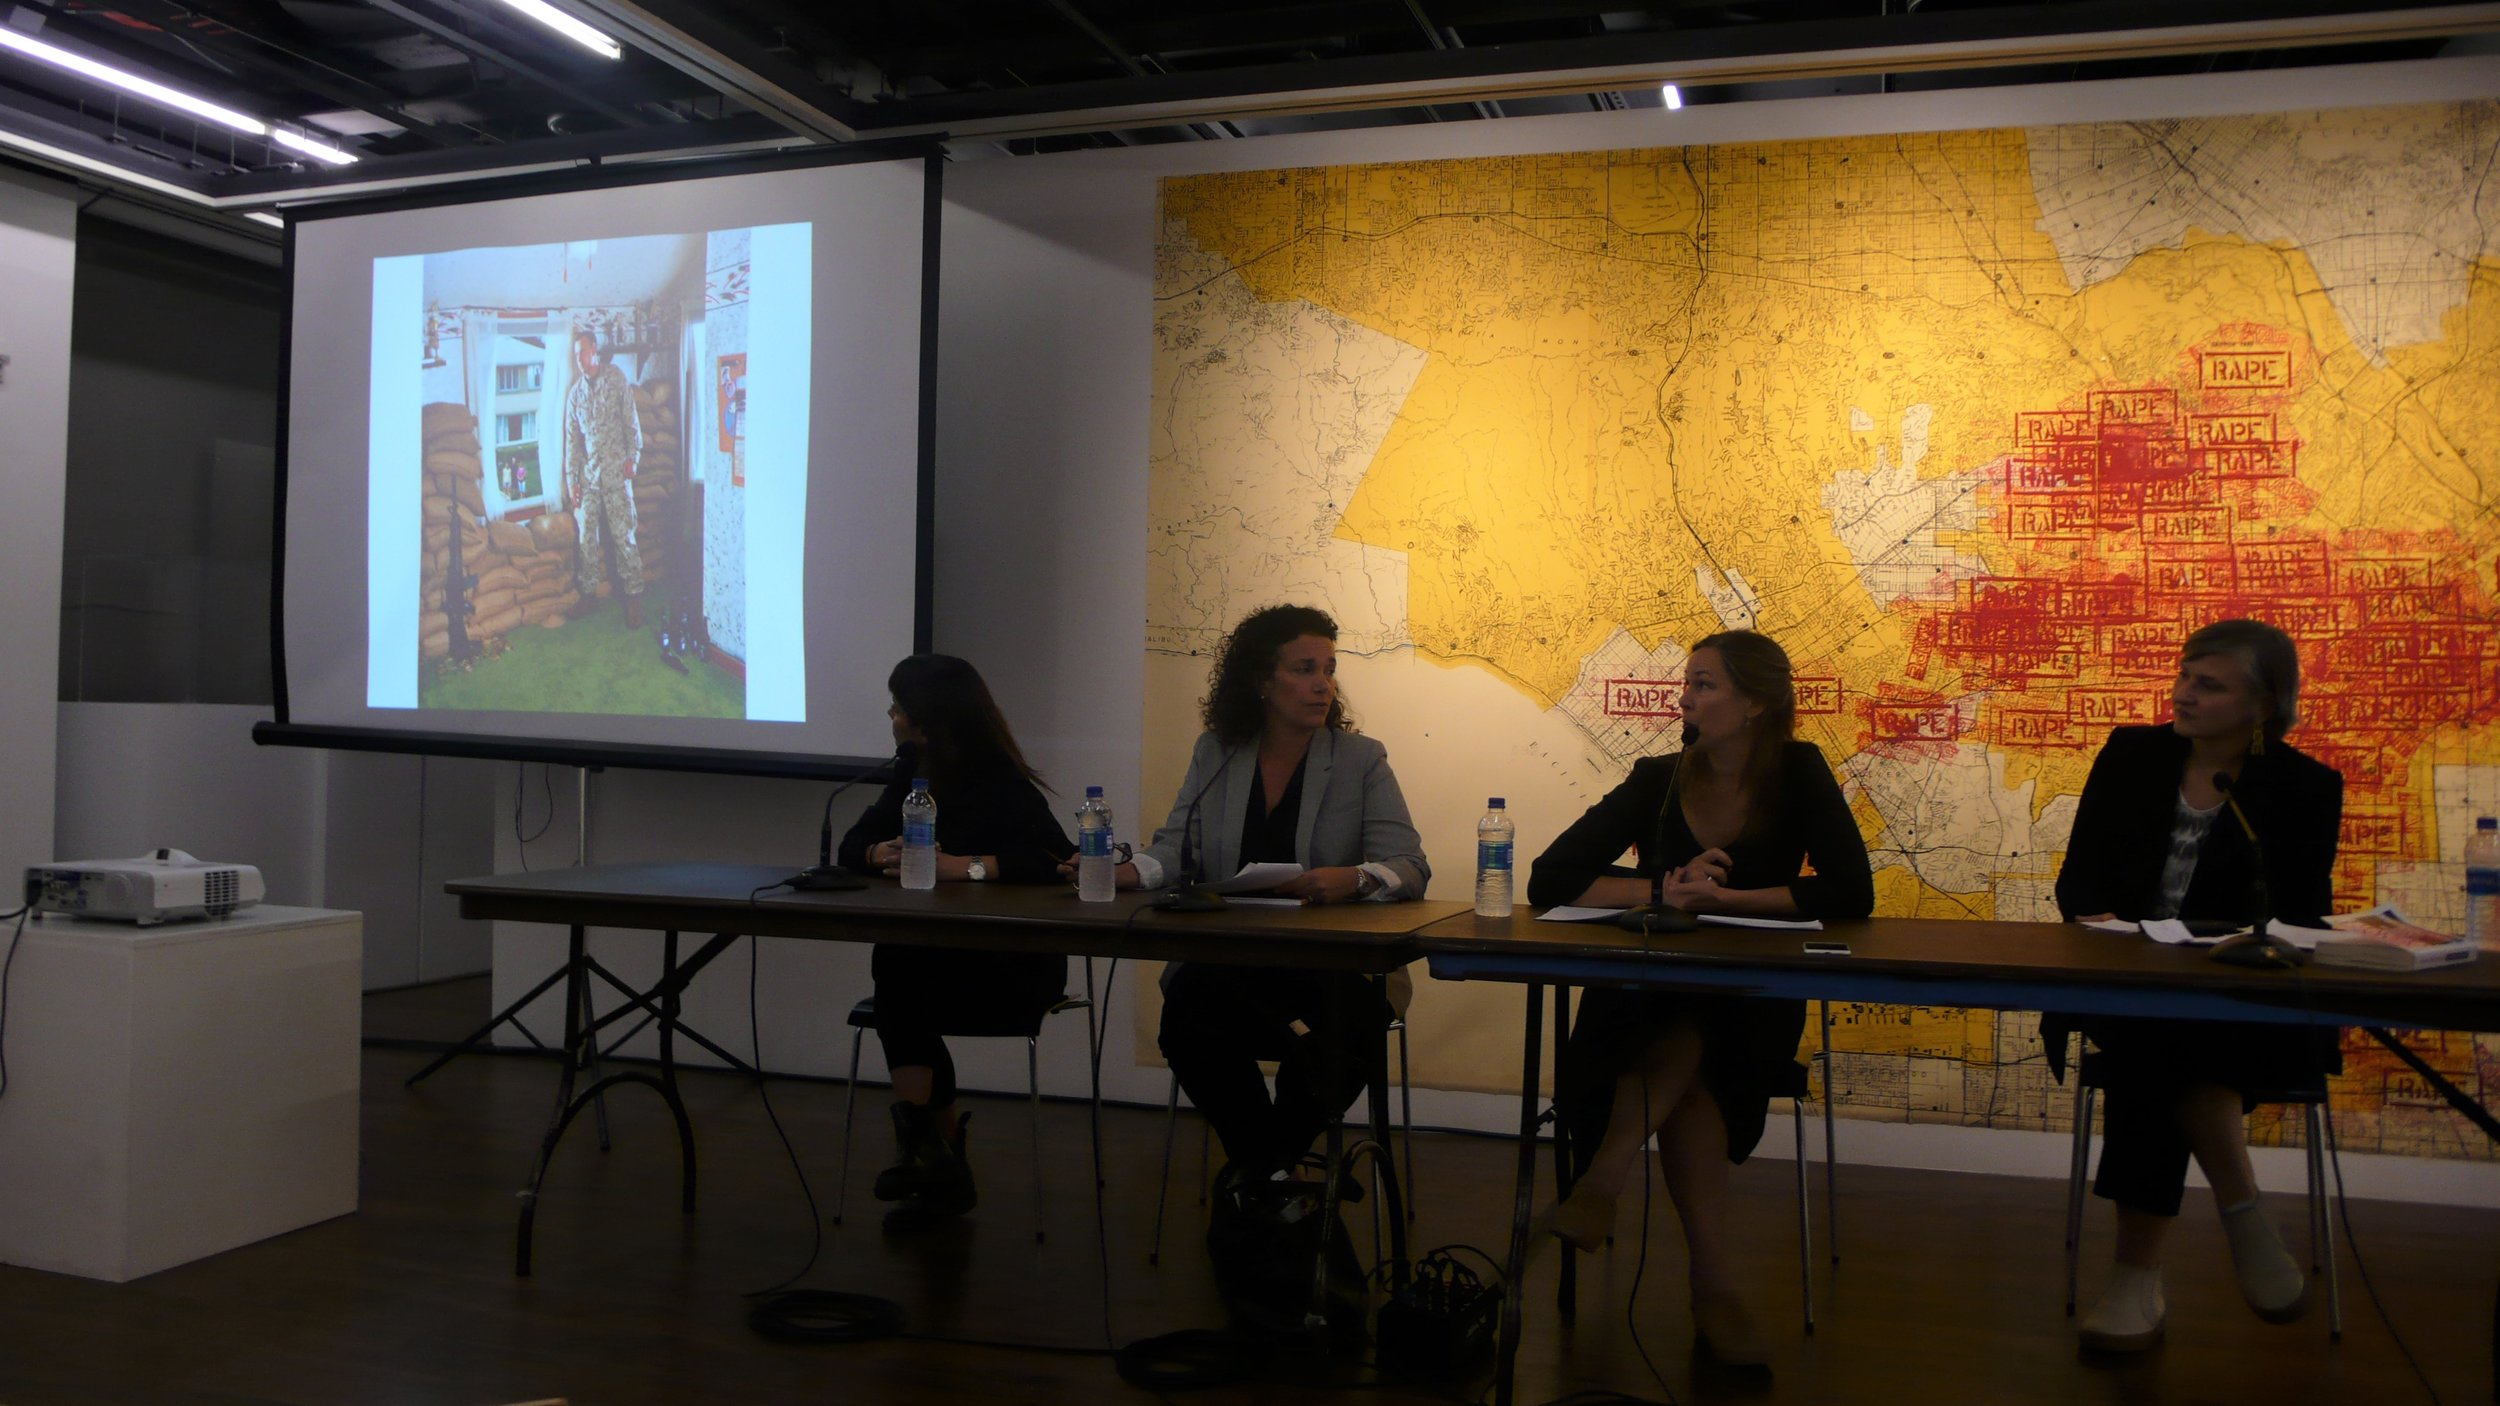 Ada Trillo, Shonna Trinch, Jennifer Karady, Christine Clifford_The Un-Heroic Act_Artist Talk_Sept. 26 2018. Photo Jerzy Warman